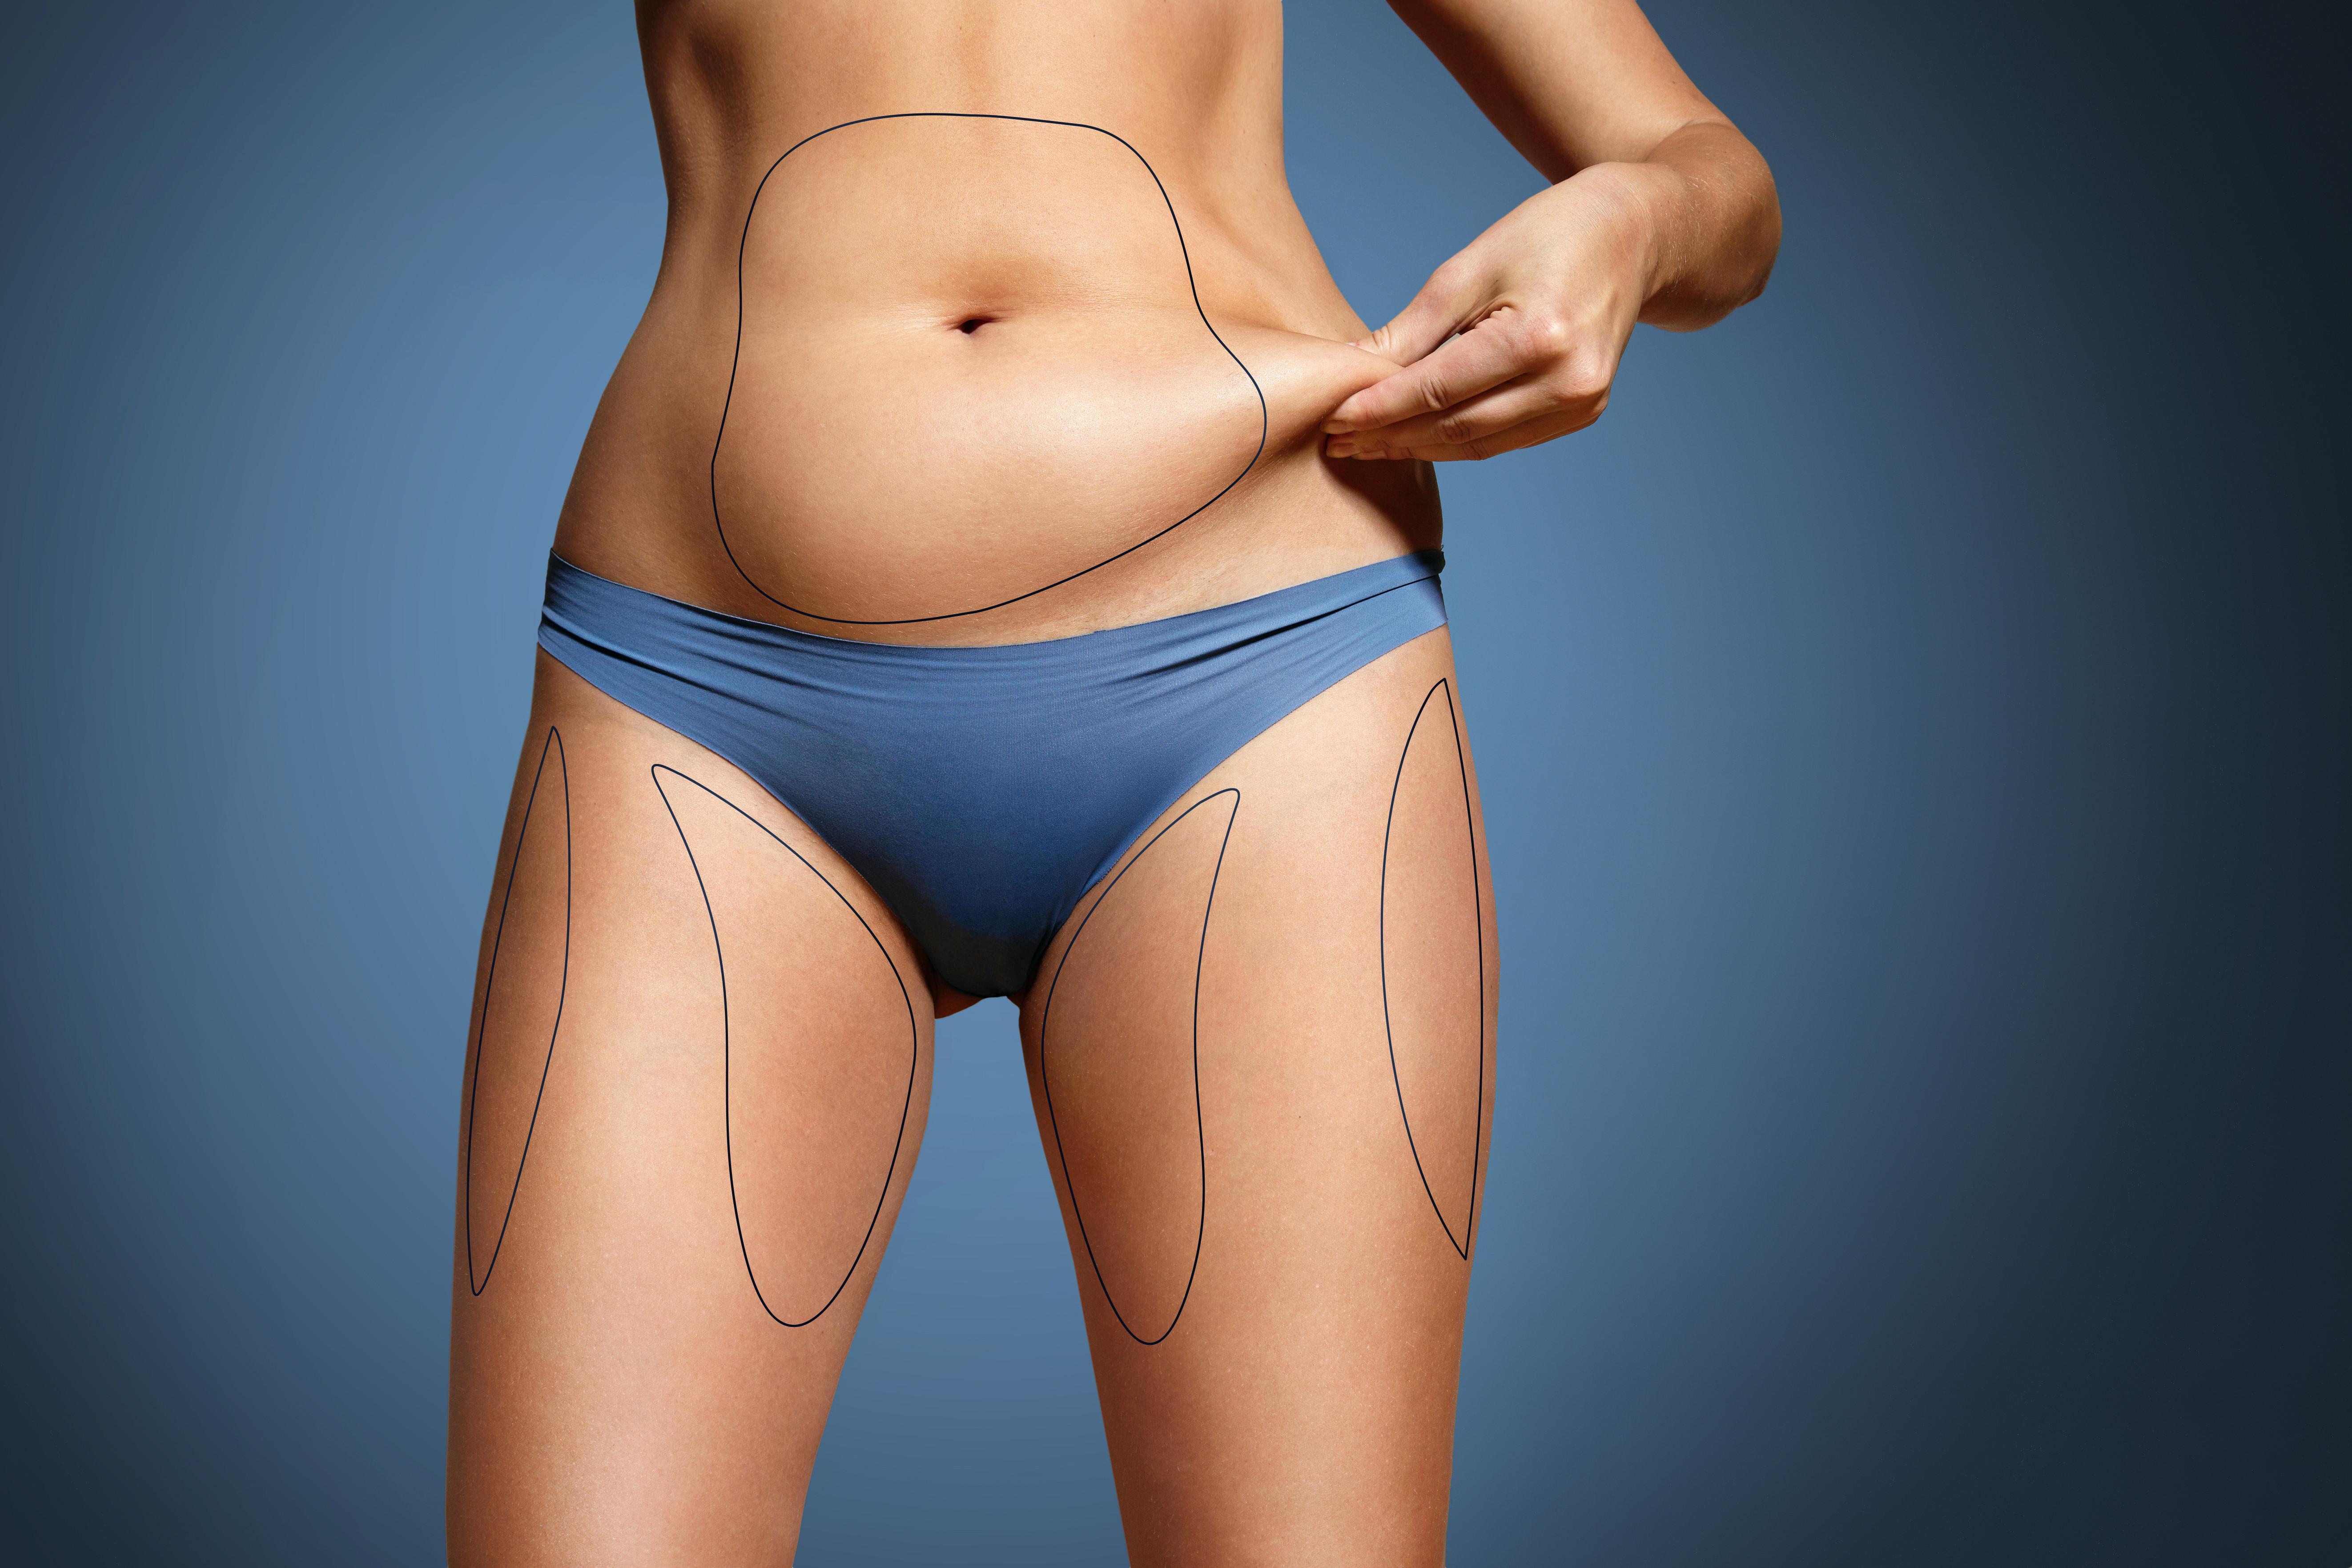 Aqualyx Fat Dissolving Injections